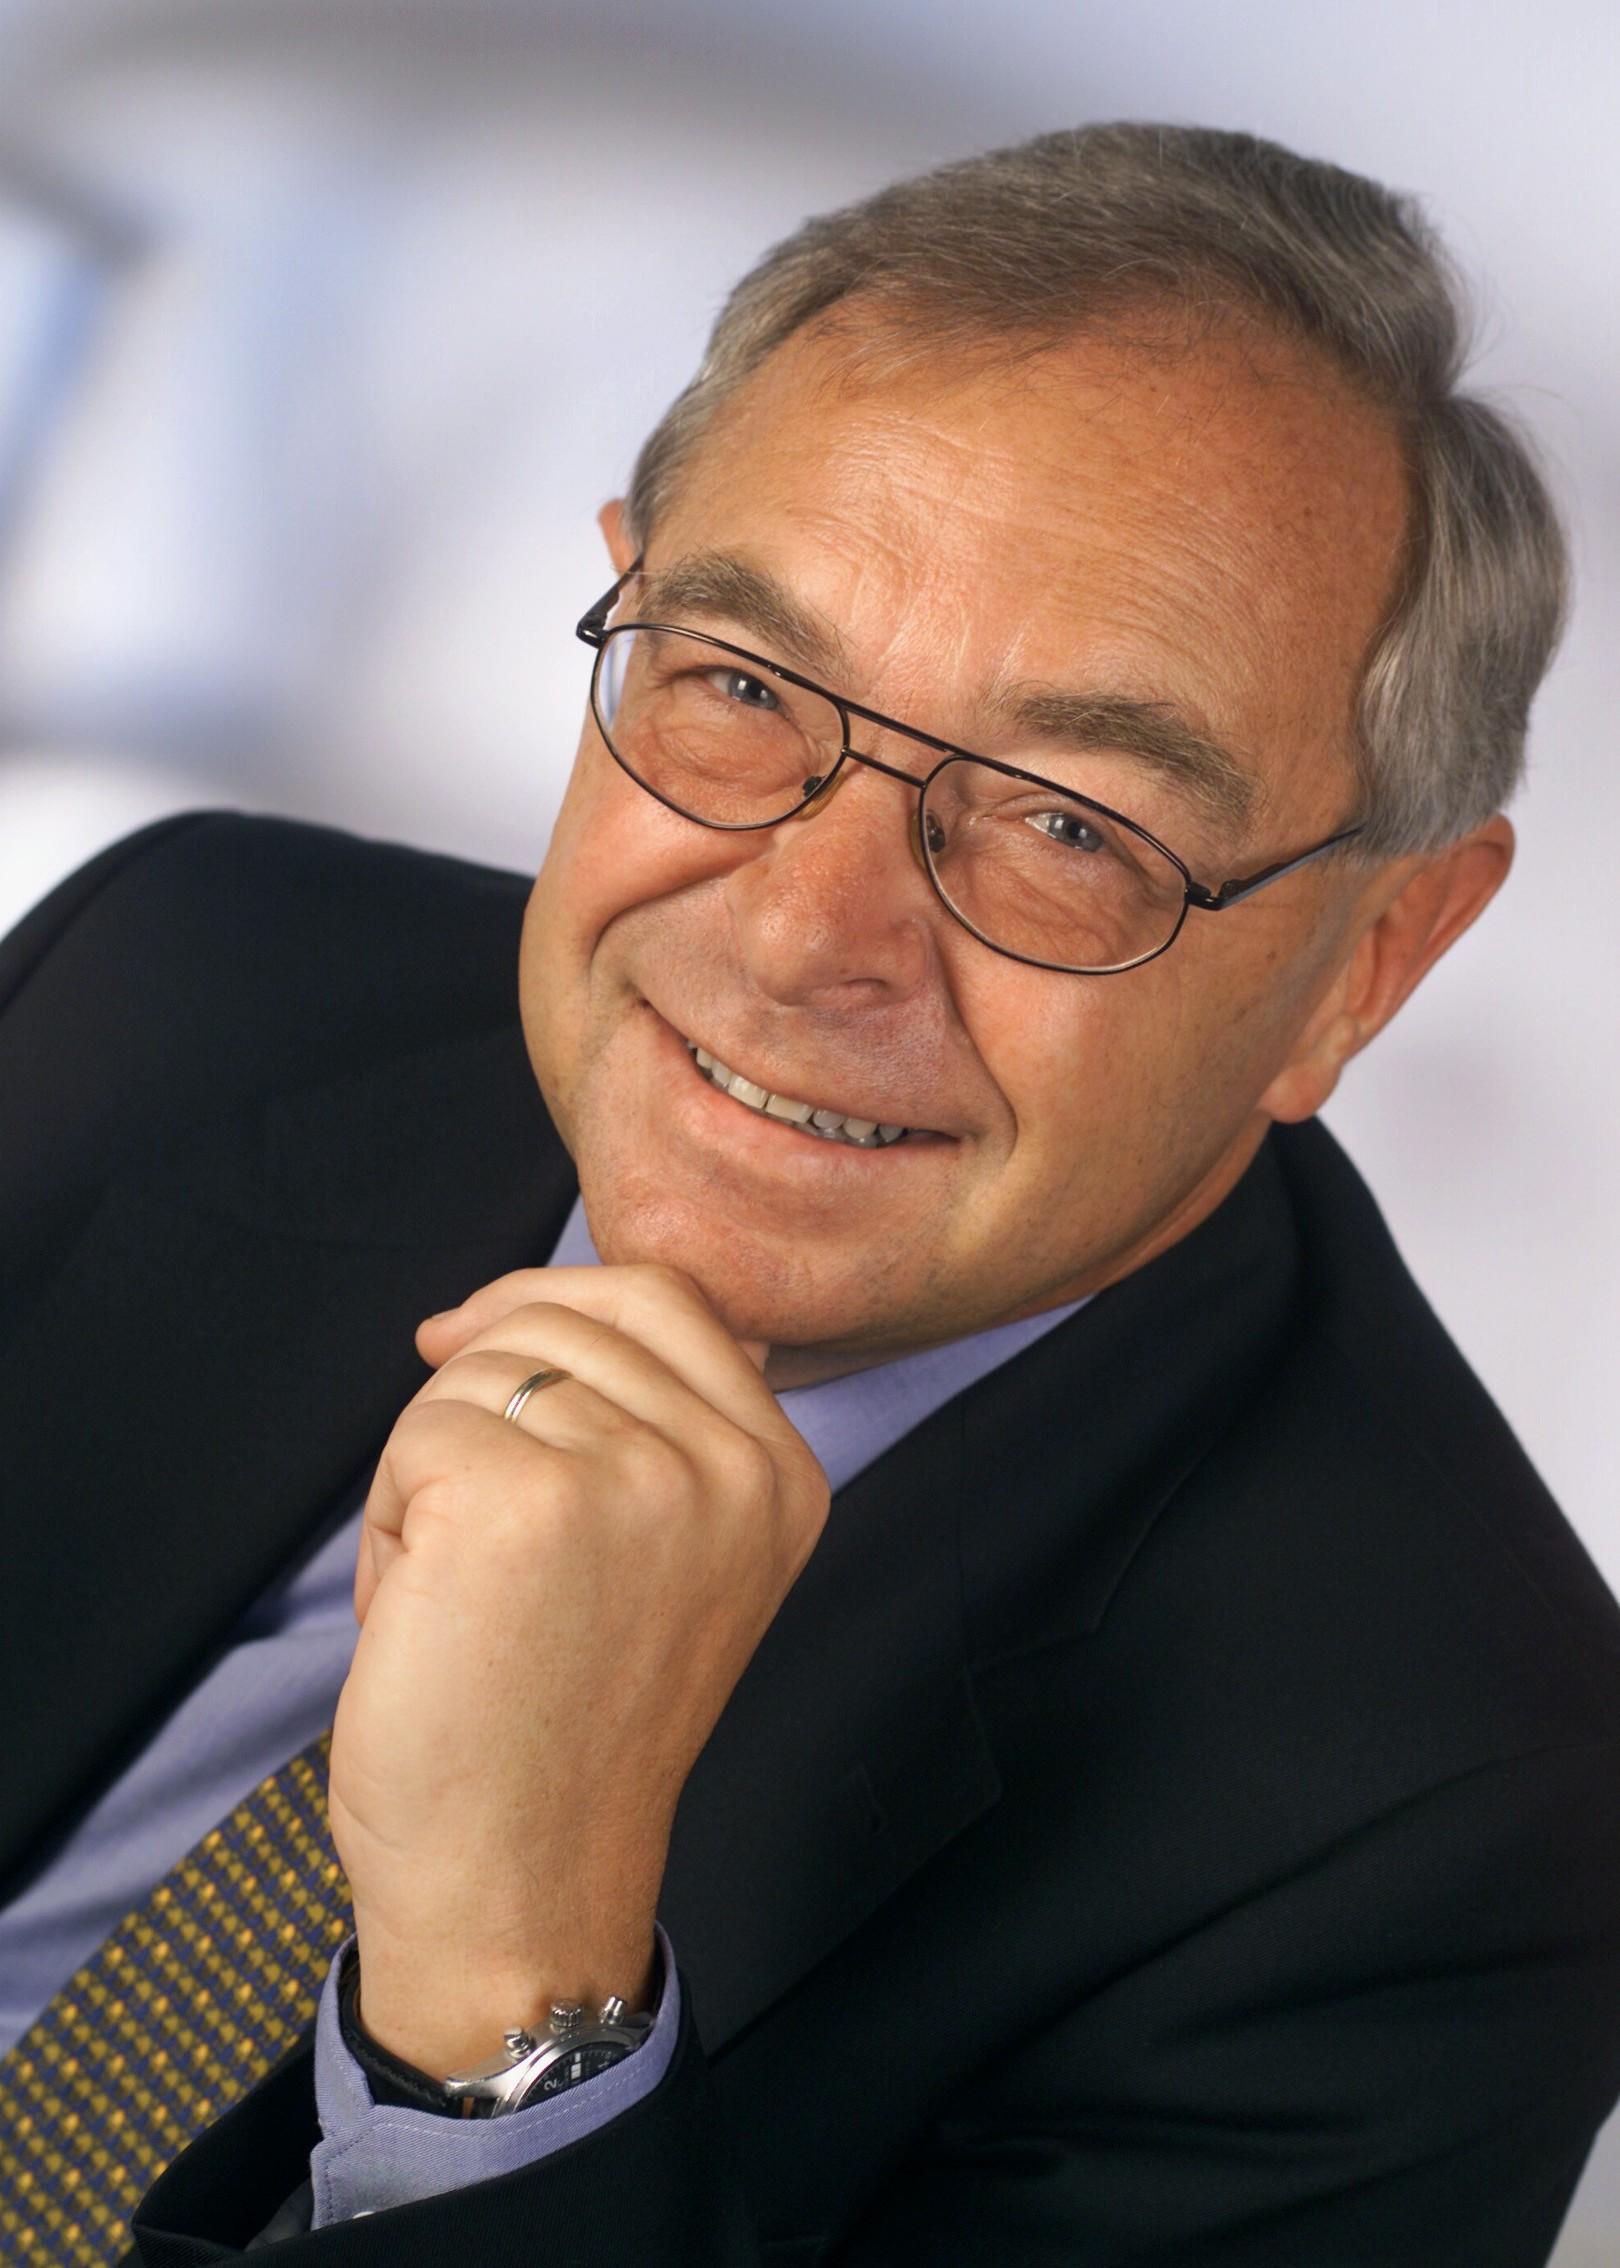 Prof. Dr. med. Norbert Bachl